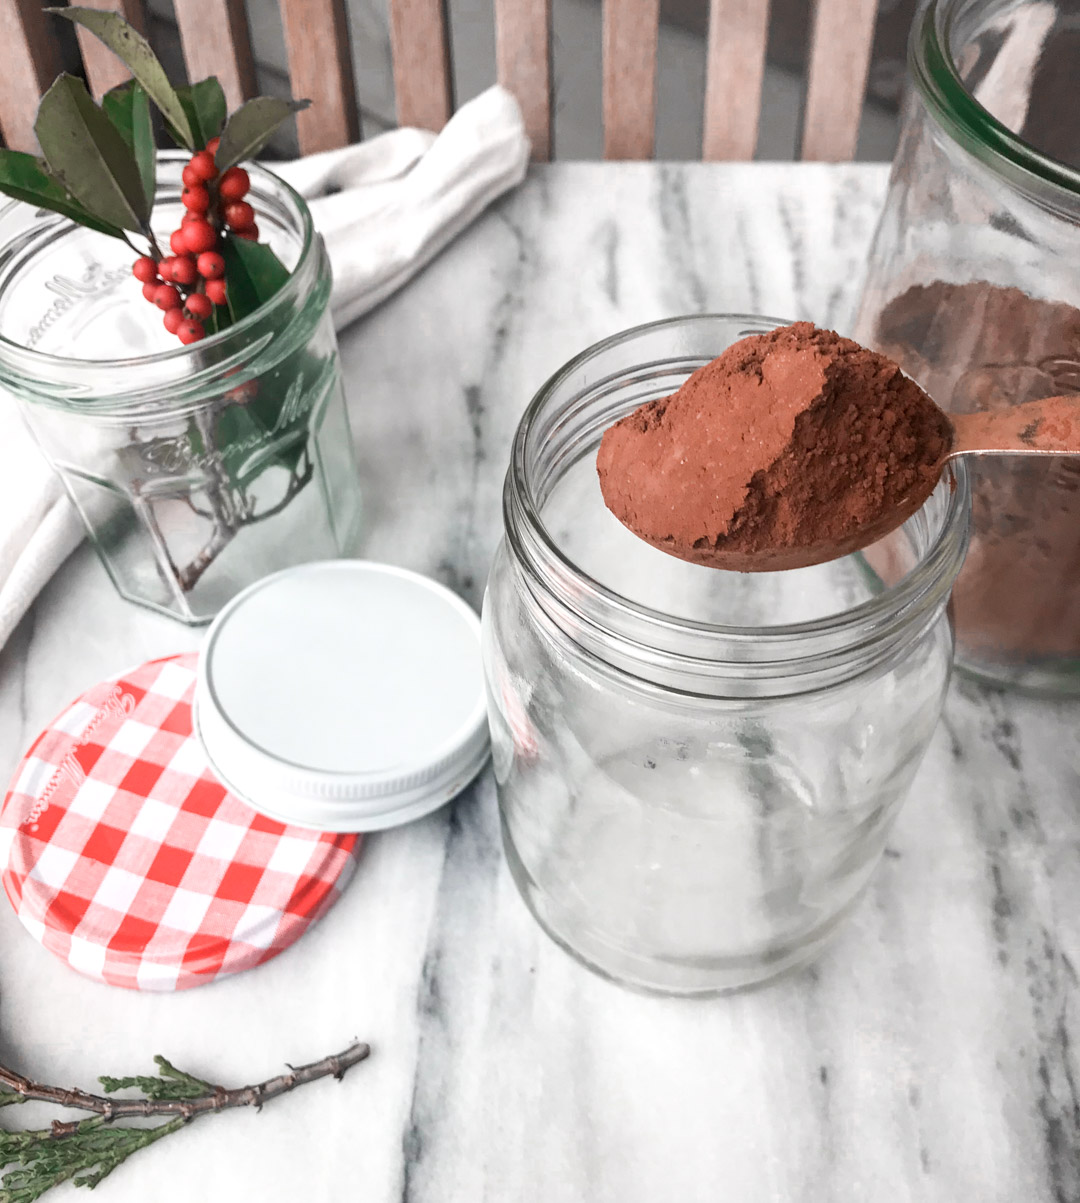 DIY Cocoa Gift-1401